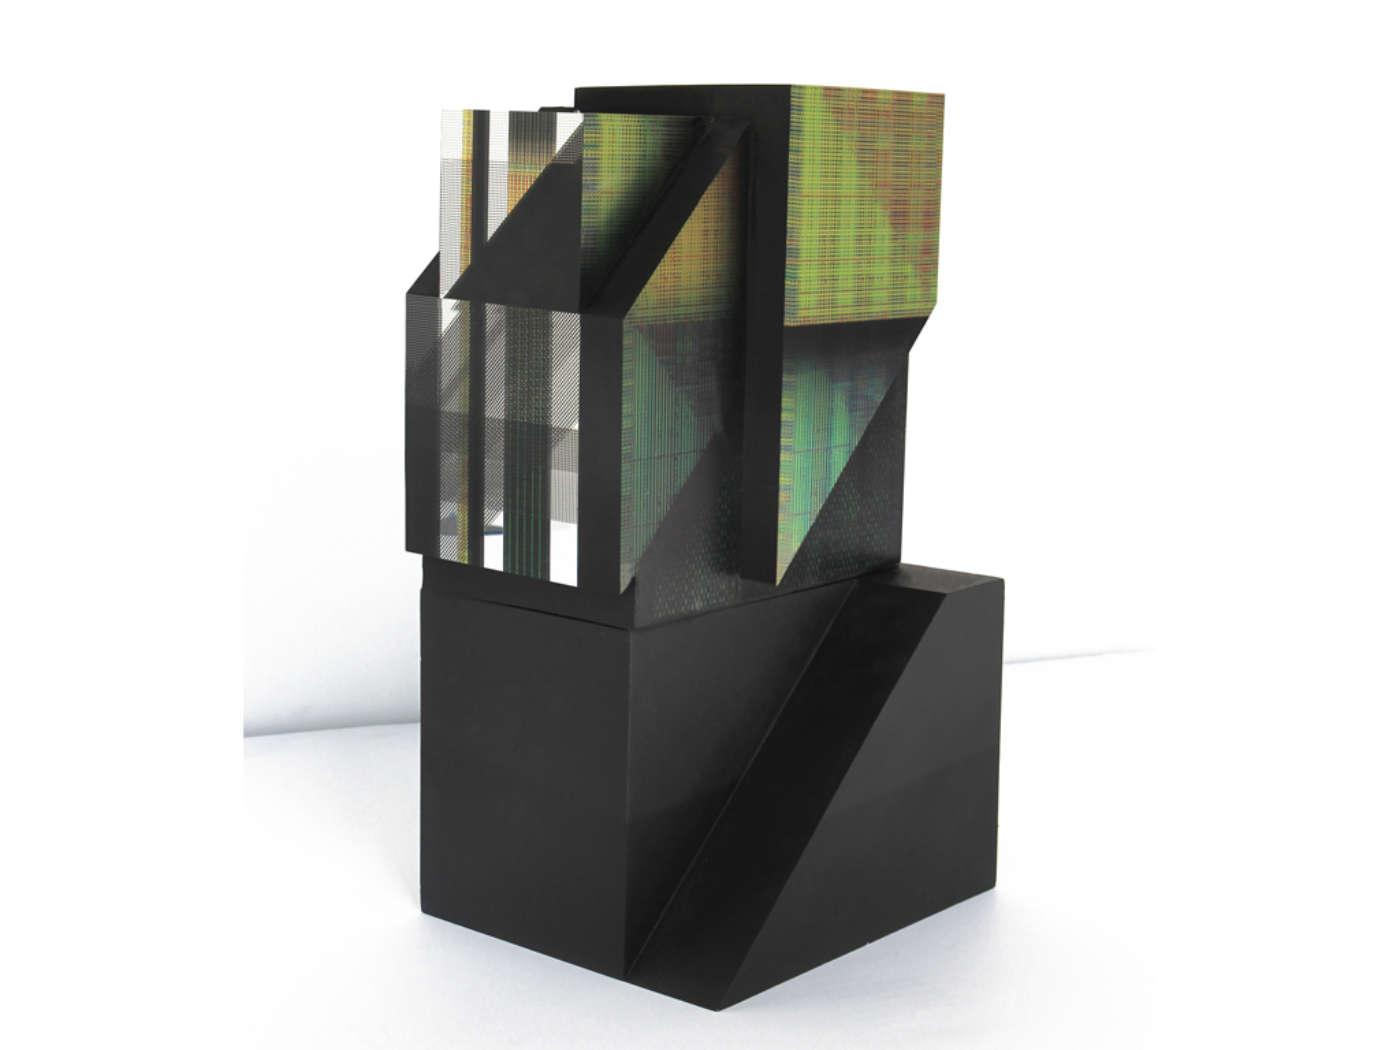 Atelier Manferdini Bp Model 5